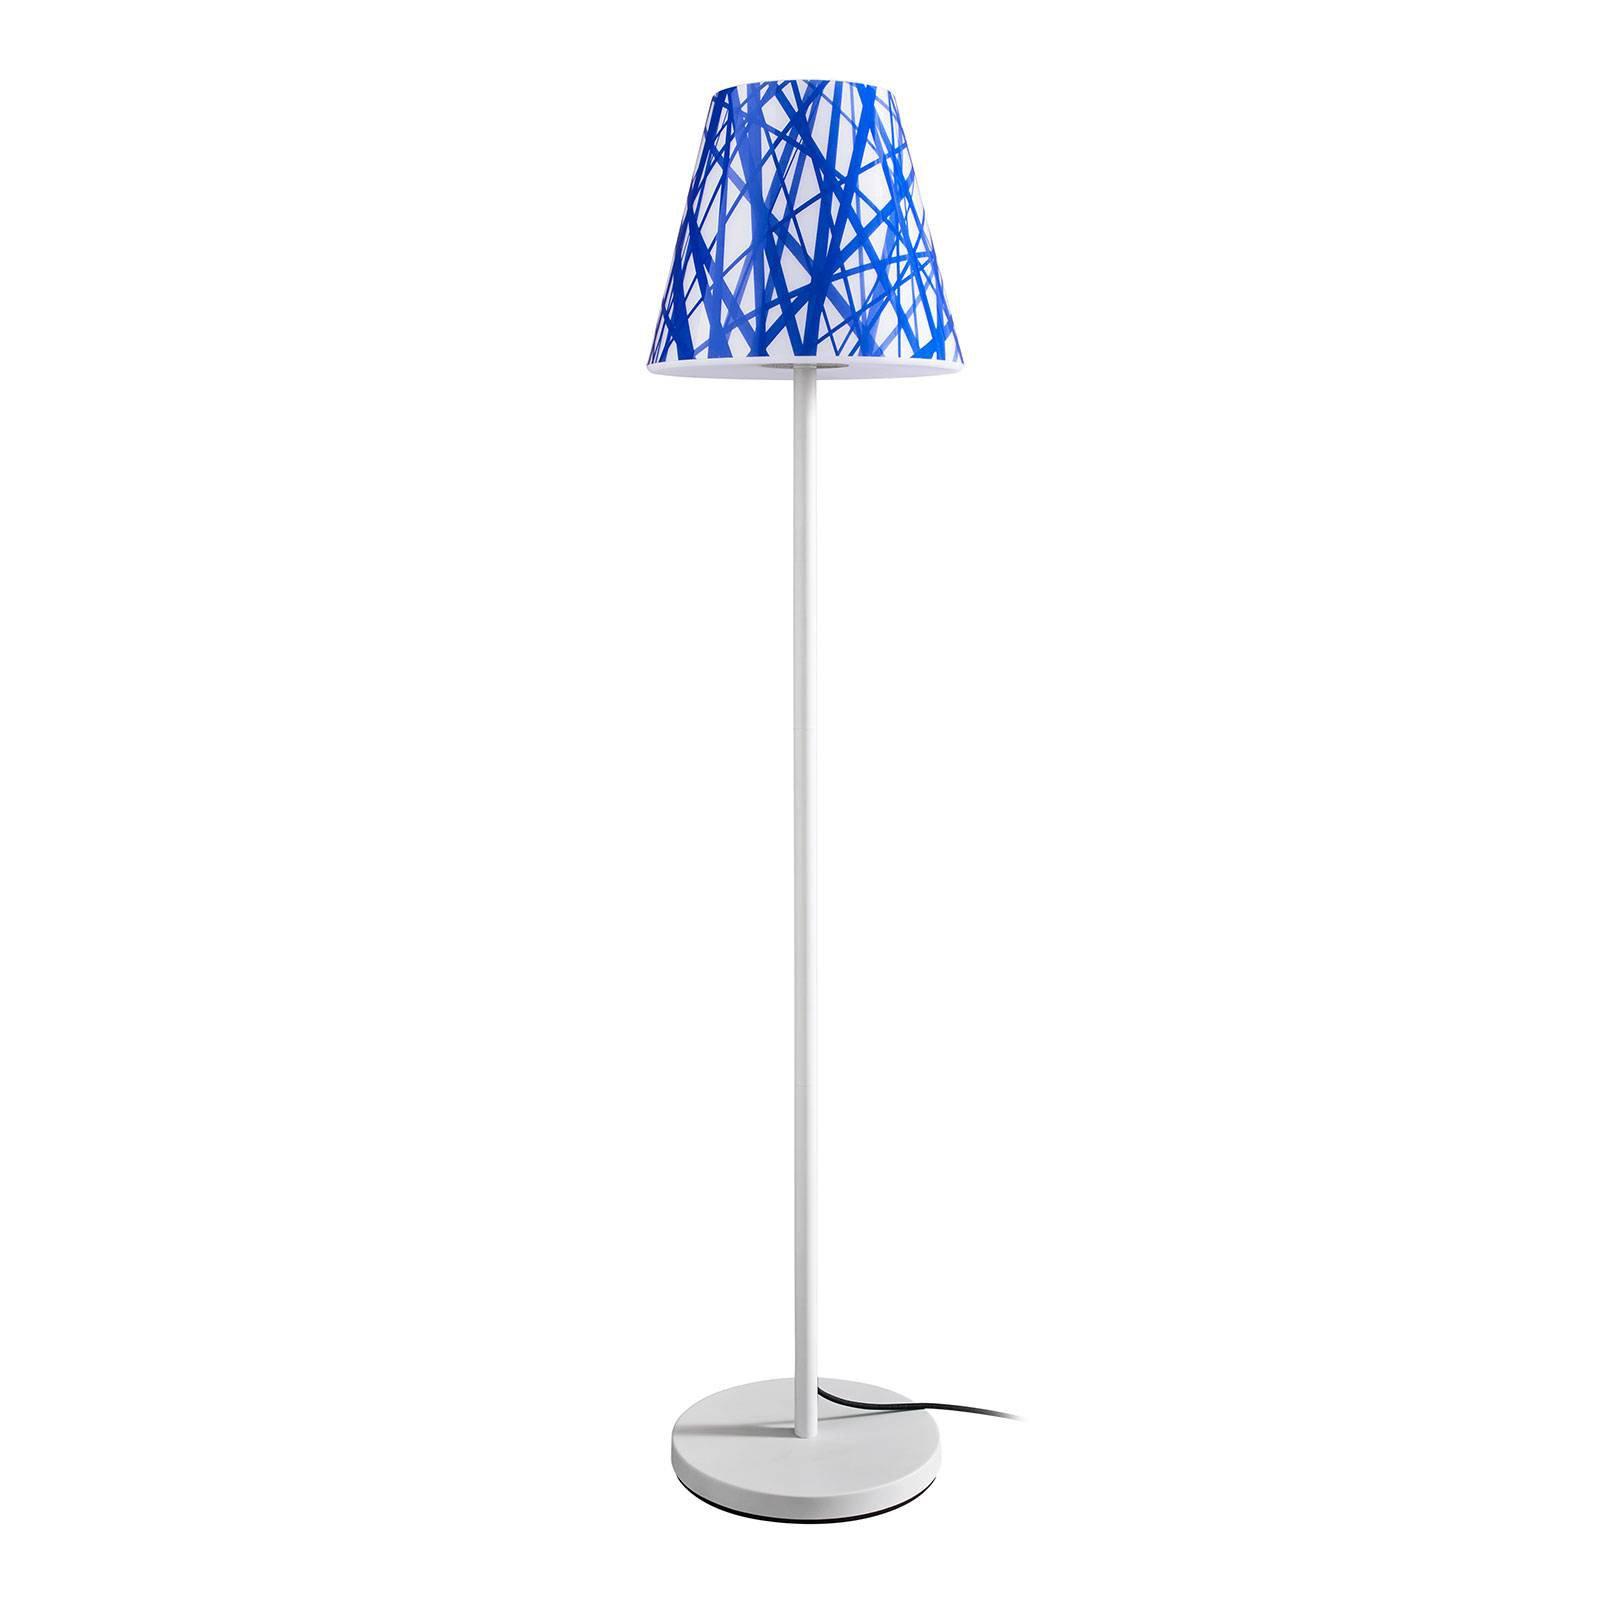 Gulvlampe Swap Outdoor, lampeskjerm med blå linjer